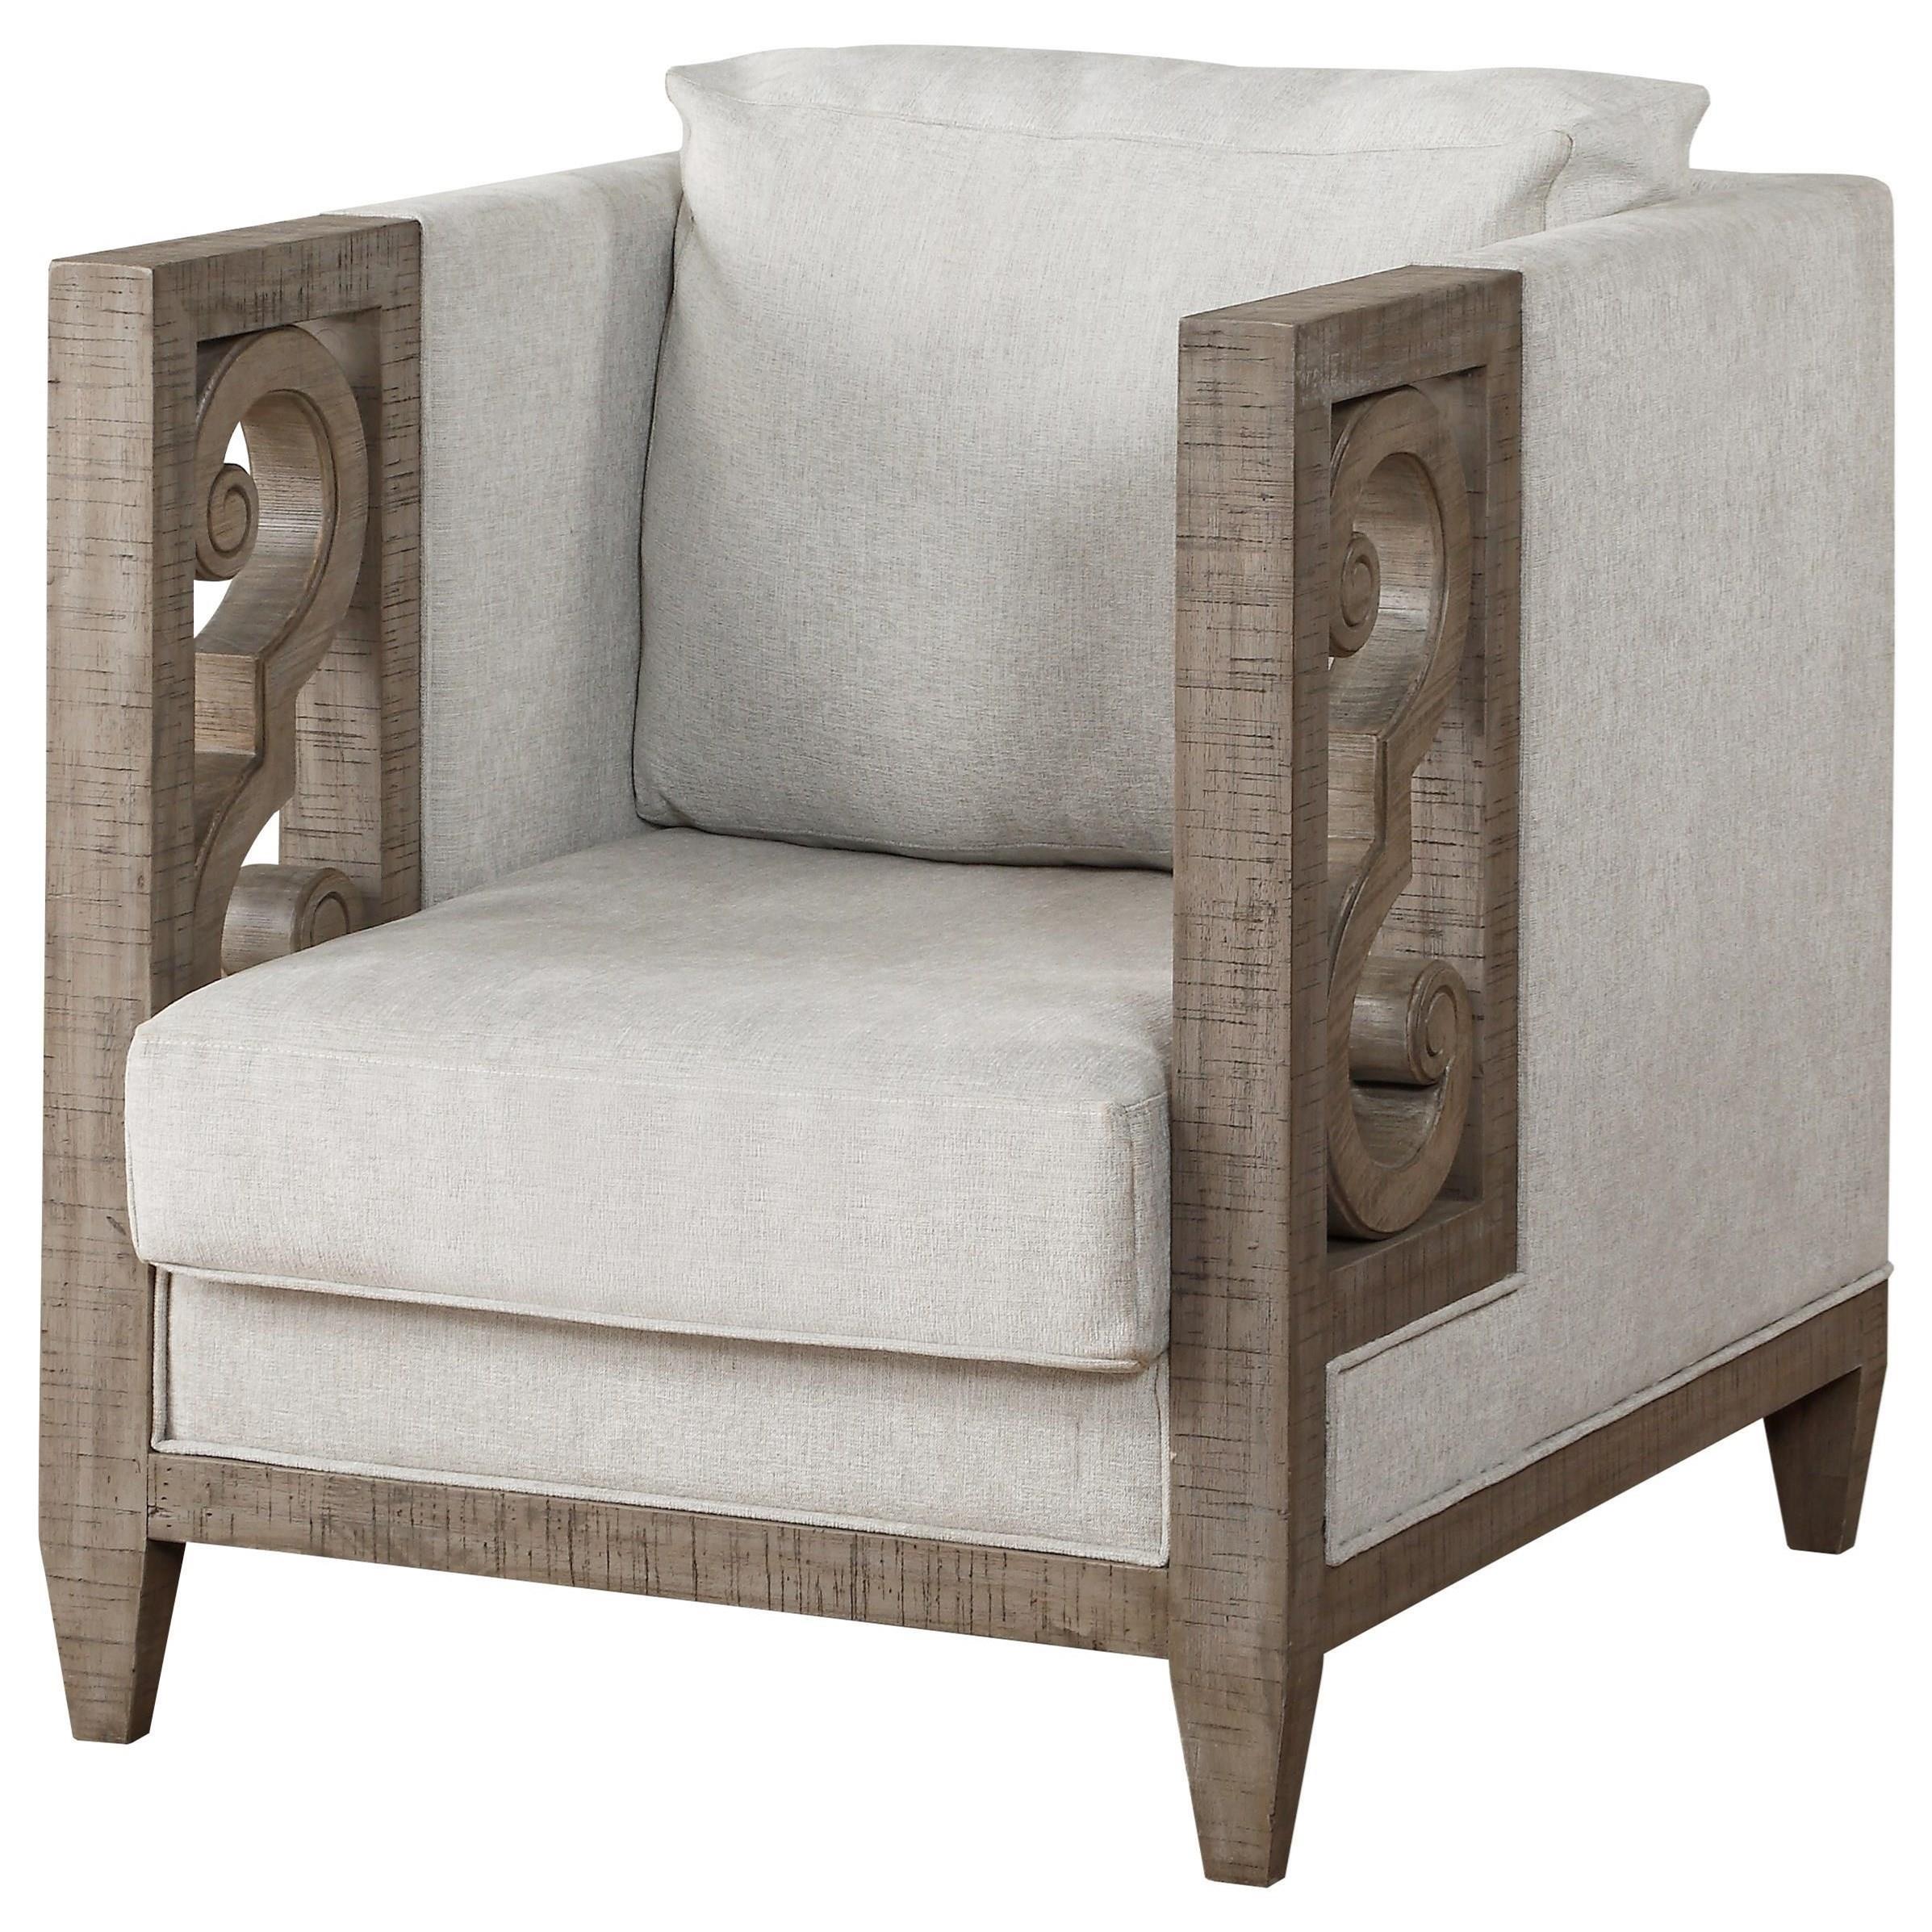 Artesia Chair by Acme Furniture at A1 Furniture & Mattress